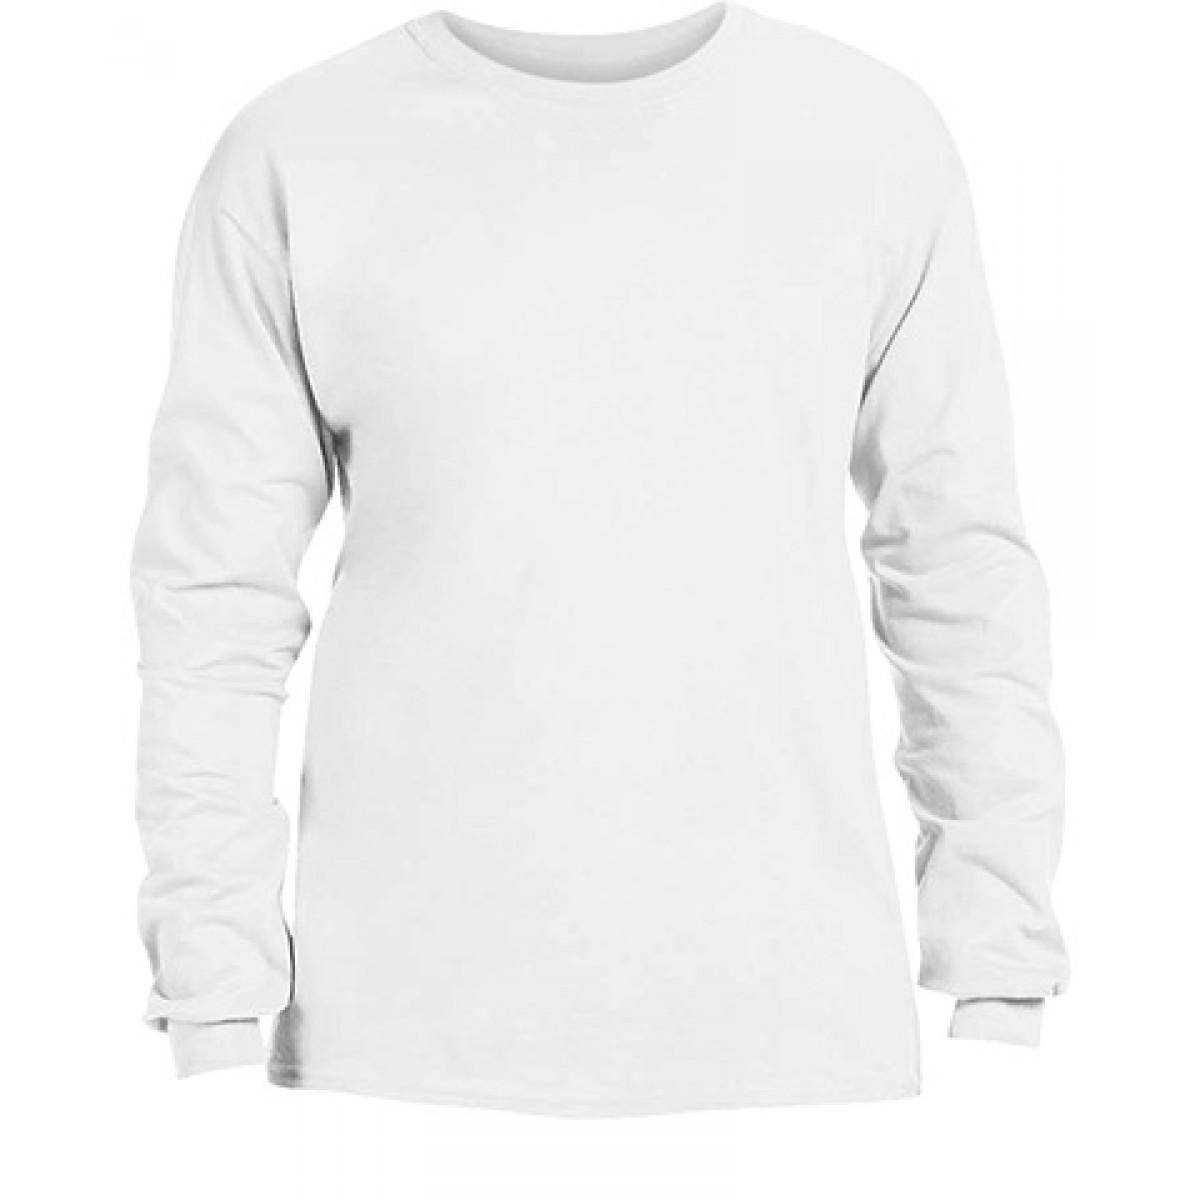 Adidas Long Sleeve T-shirt With Adidas logo-White-M